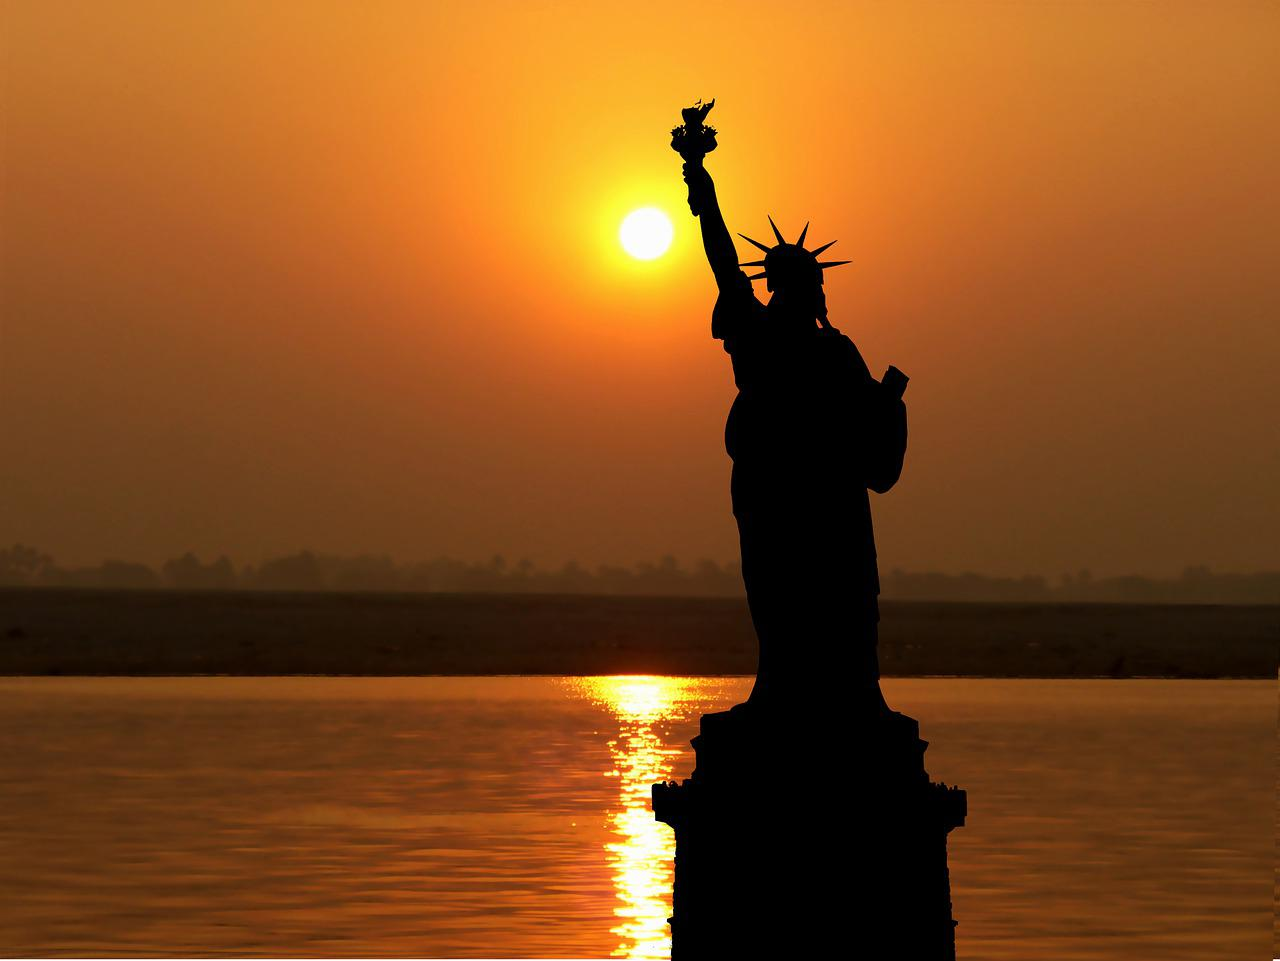 Sunset America New York Statue - Free photo on Pixabay